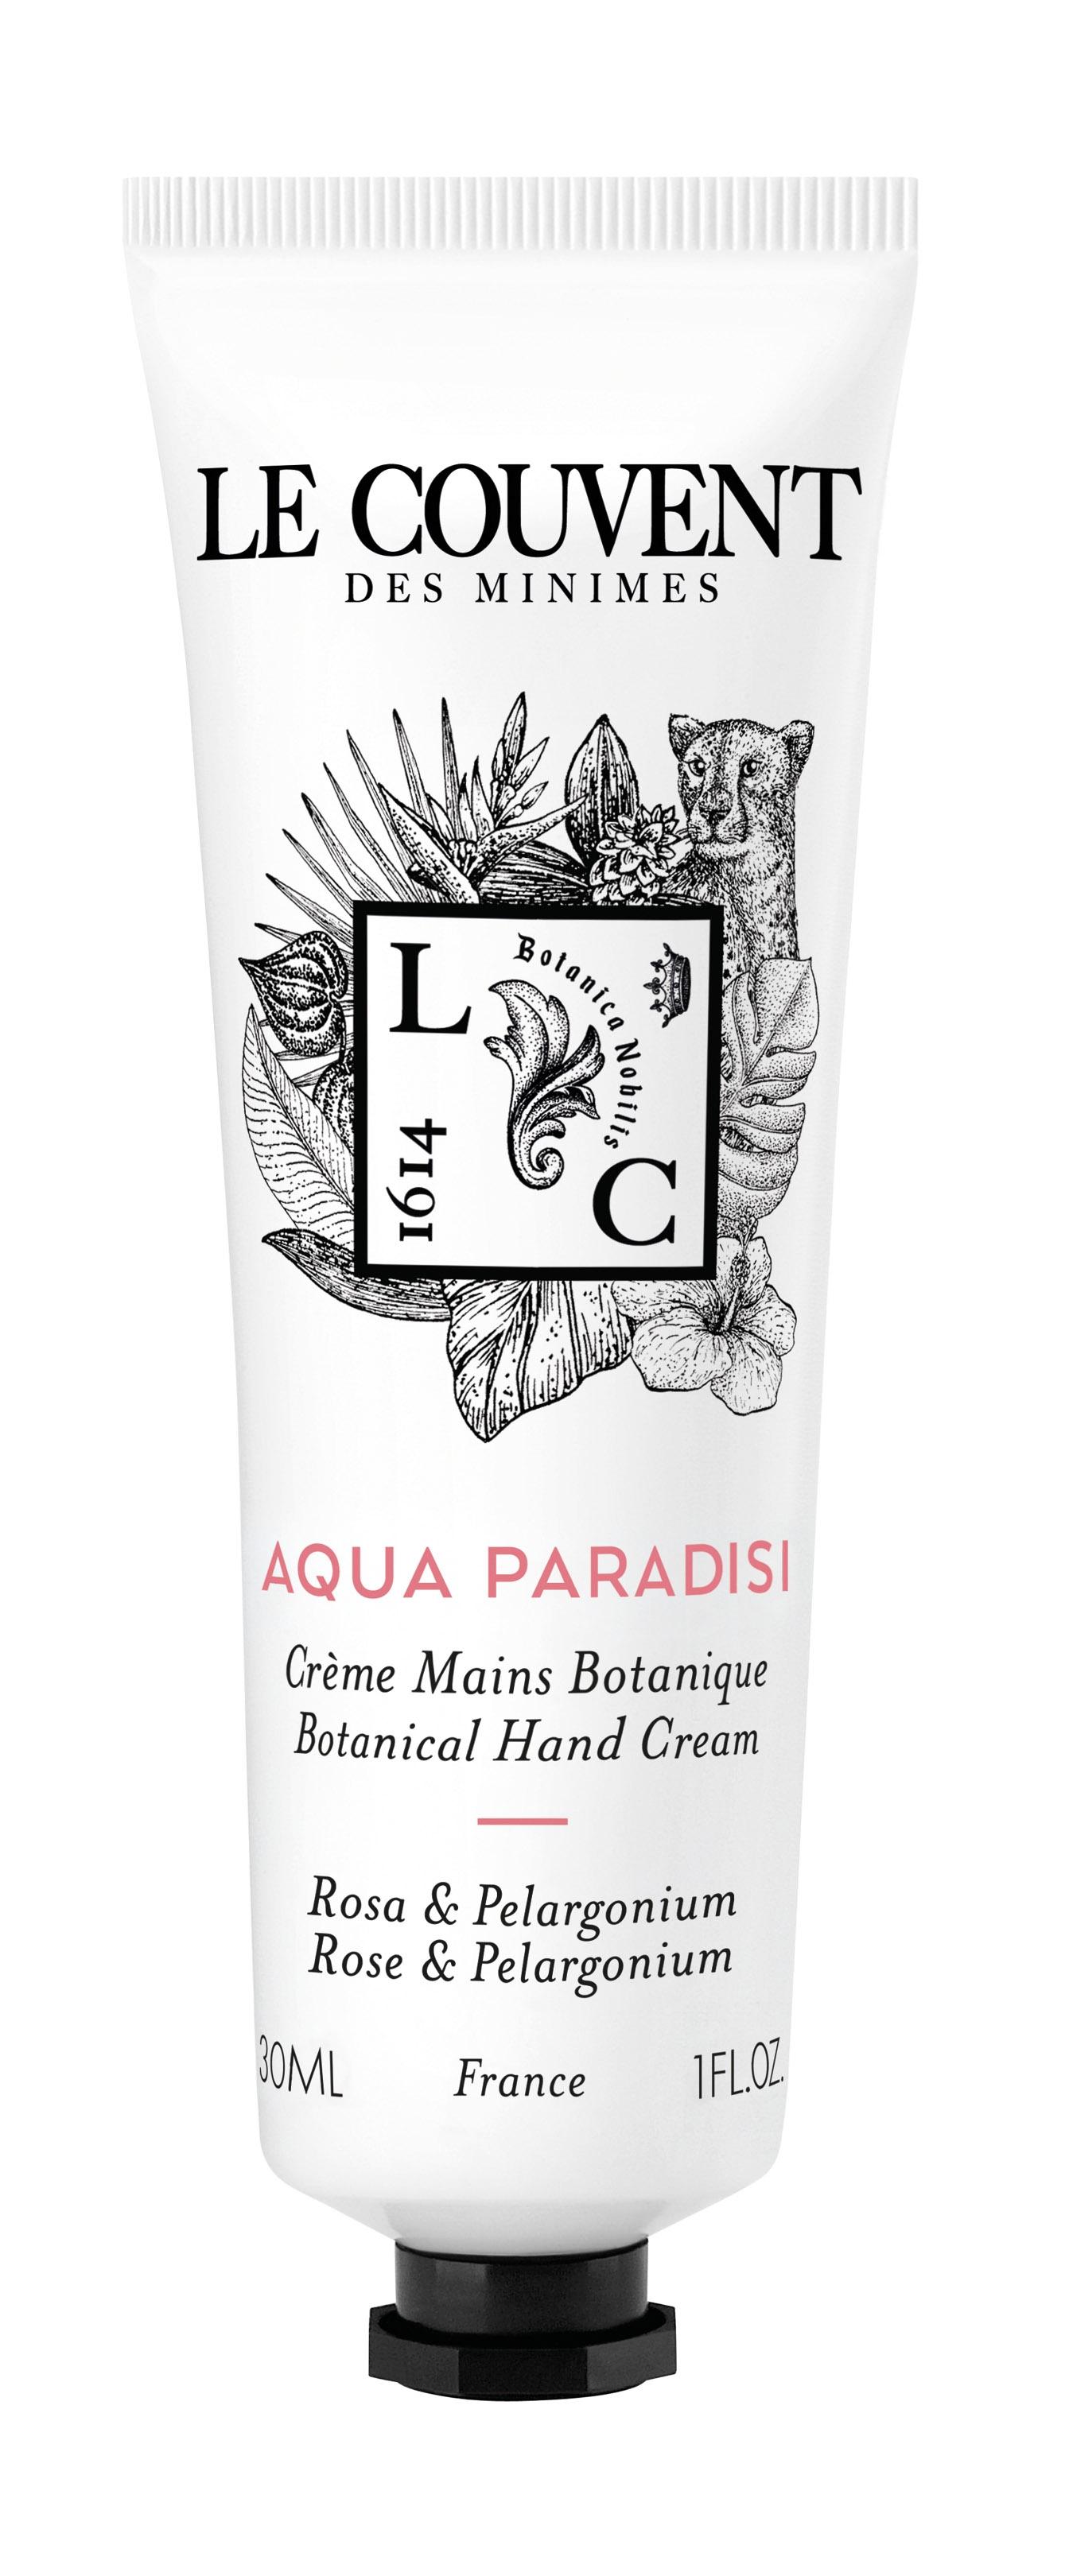 Botanical Aqua Paradisi Hand Creme 30ml